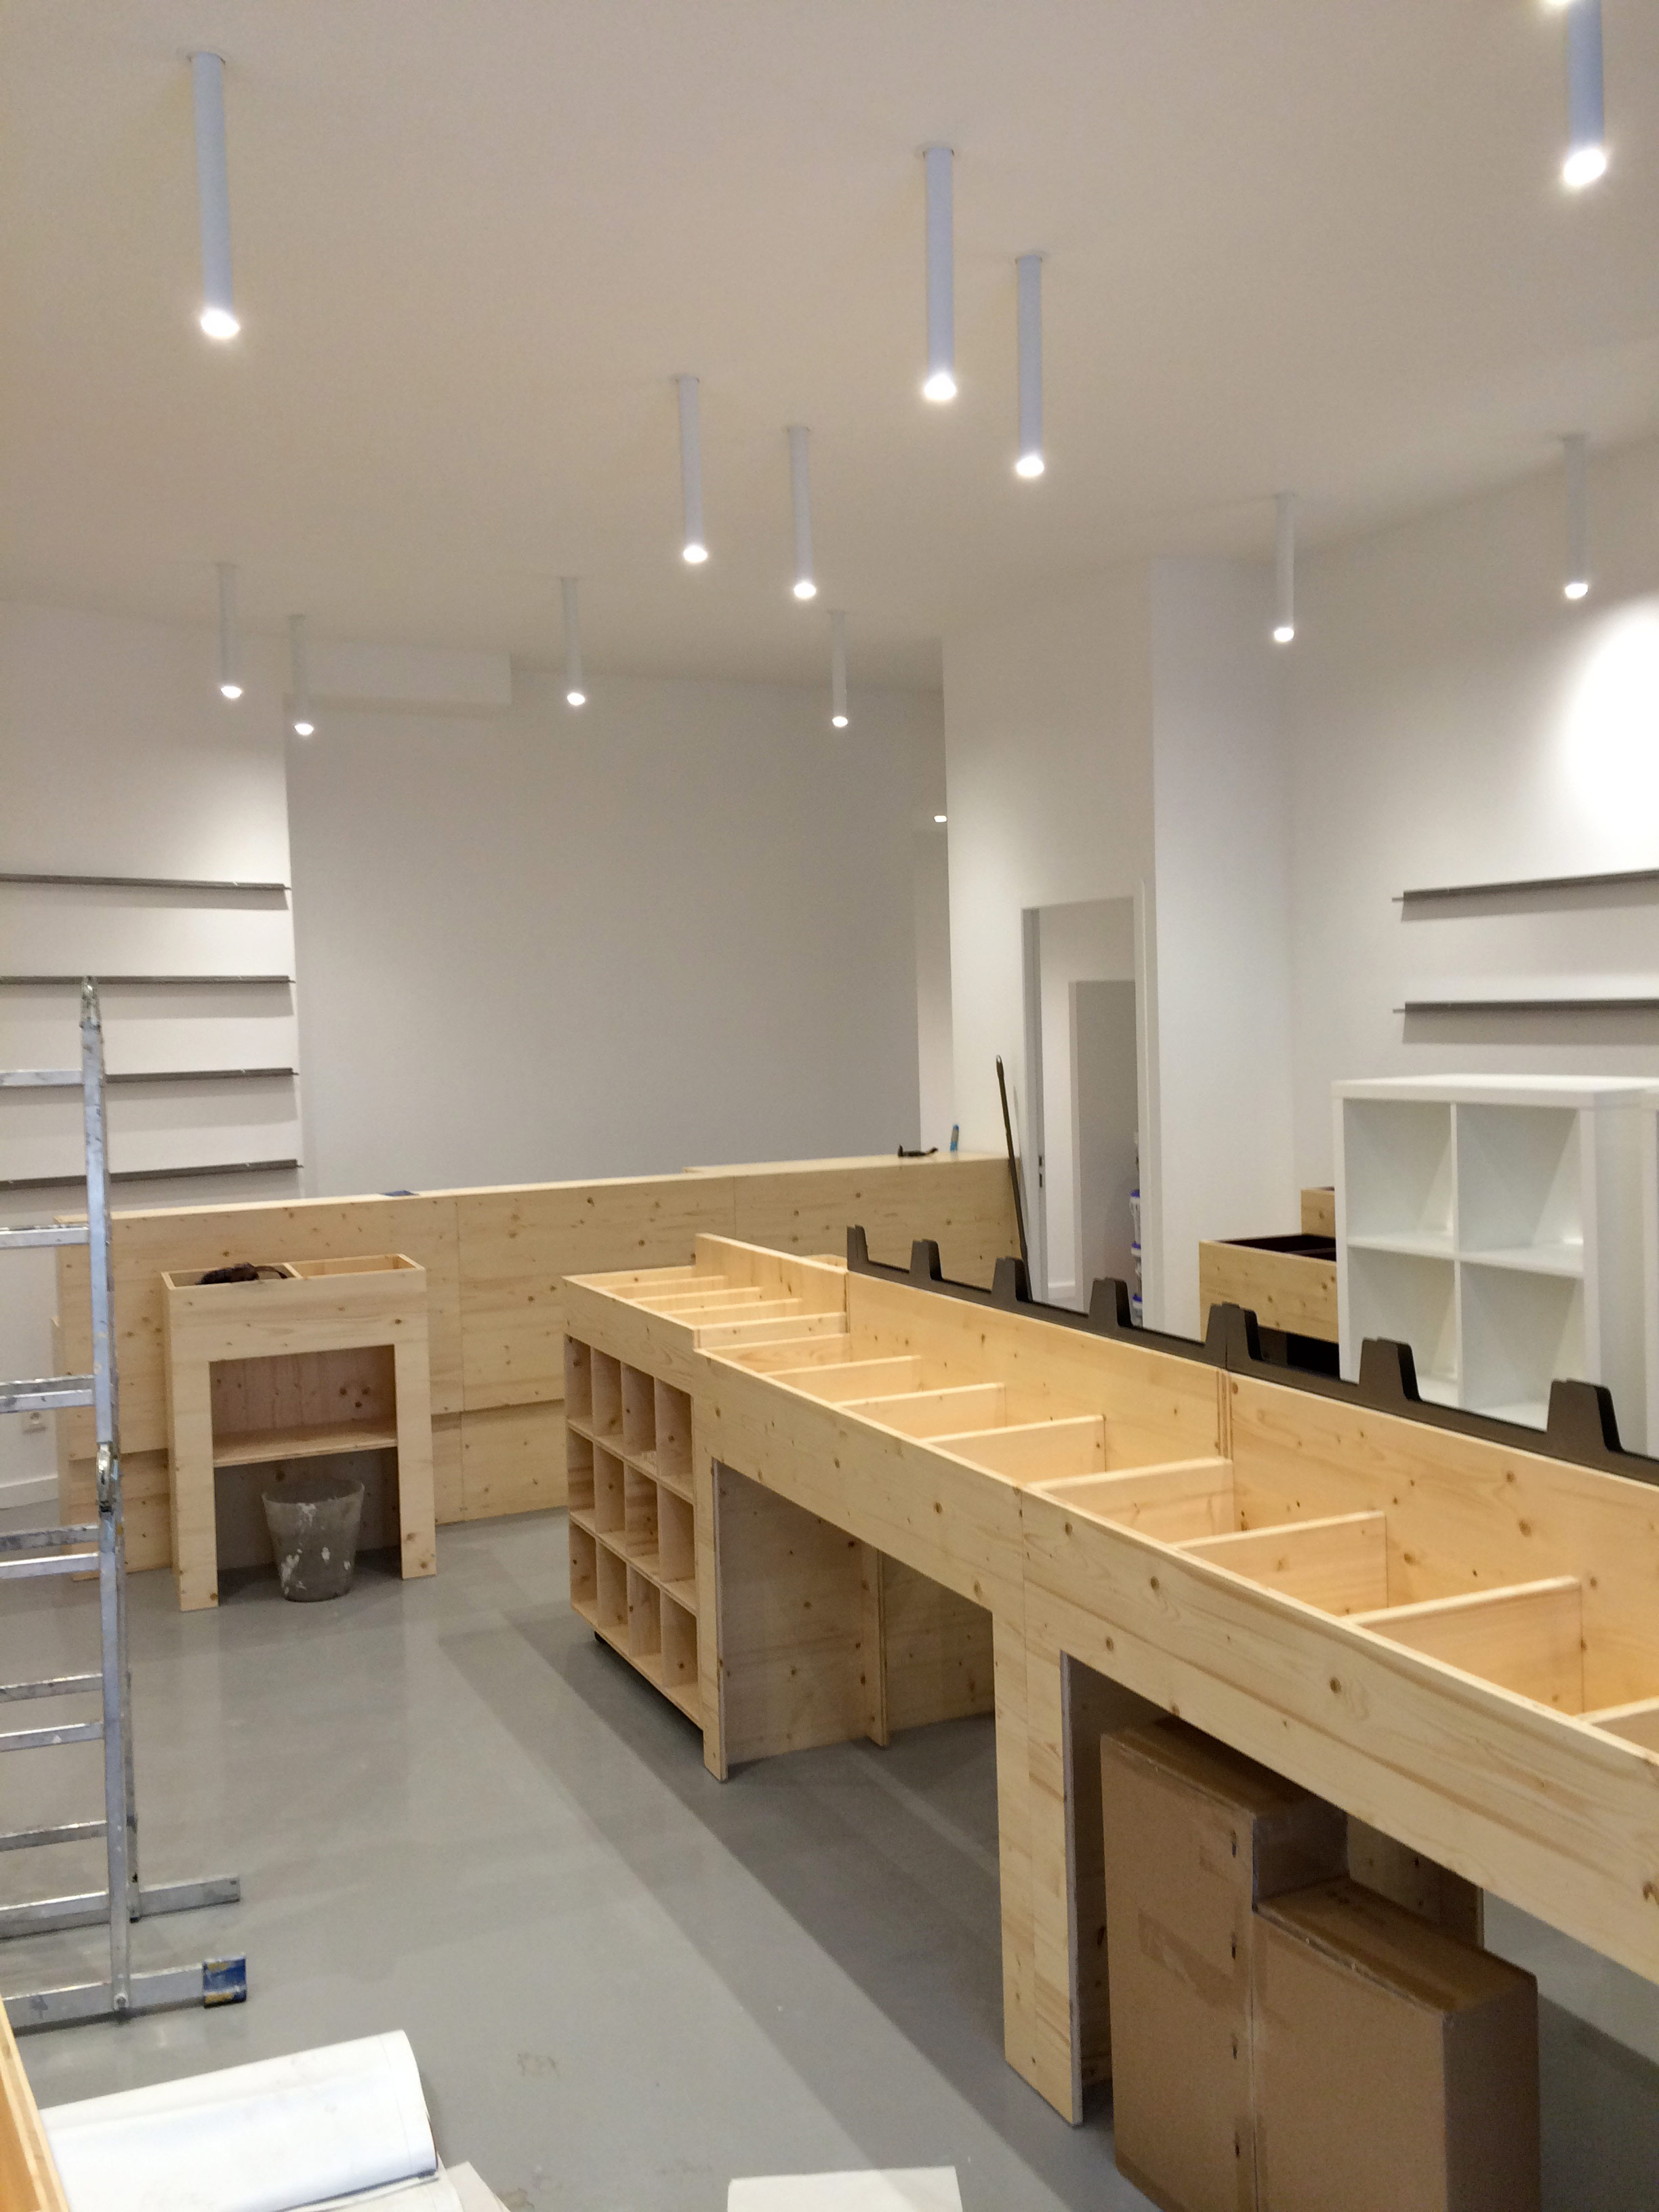 entreprise de r novation et d 39 installation d 39 lectricit lyon 69. Black Bedroom Furniture Sets. Home Design Ideas